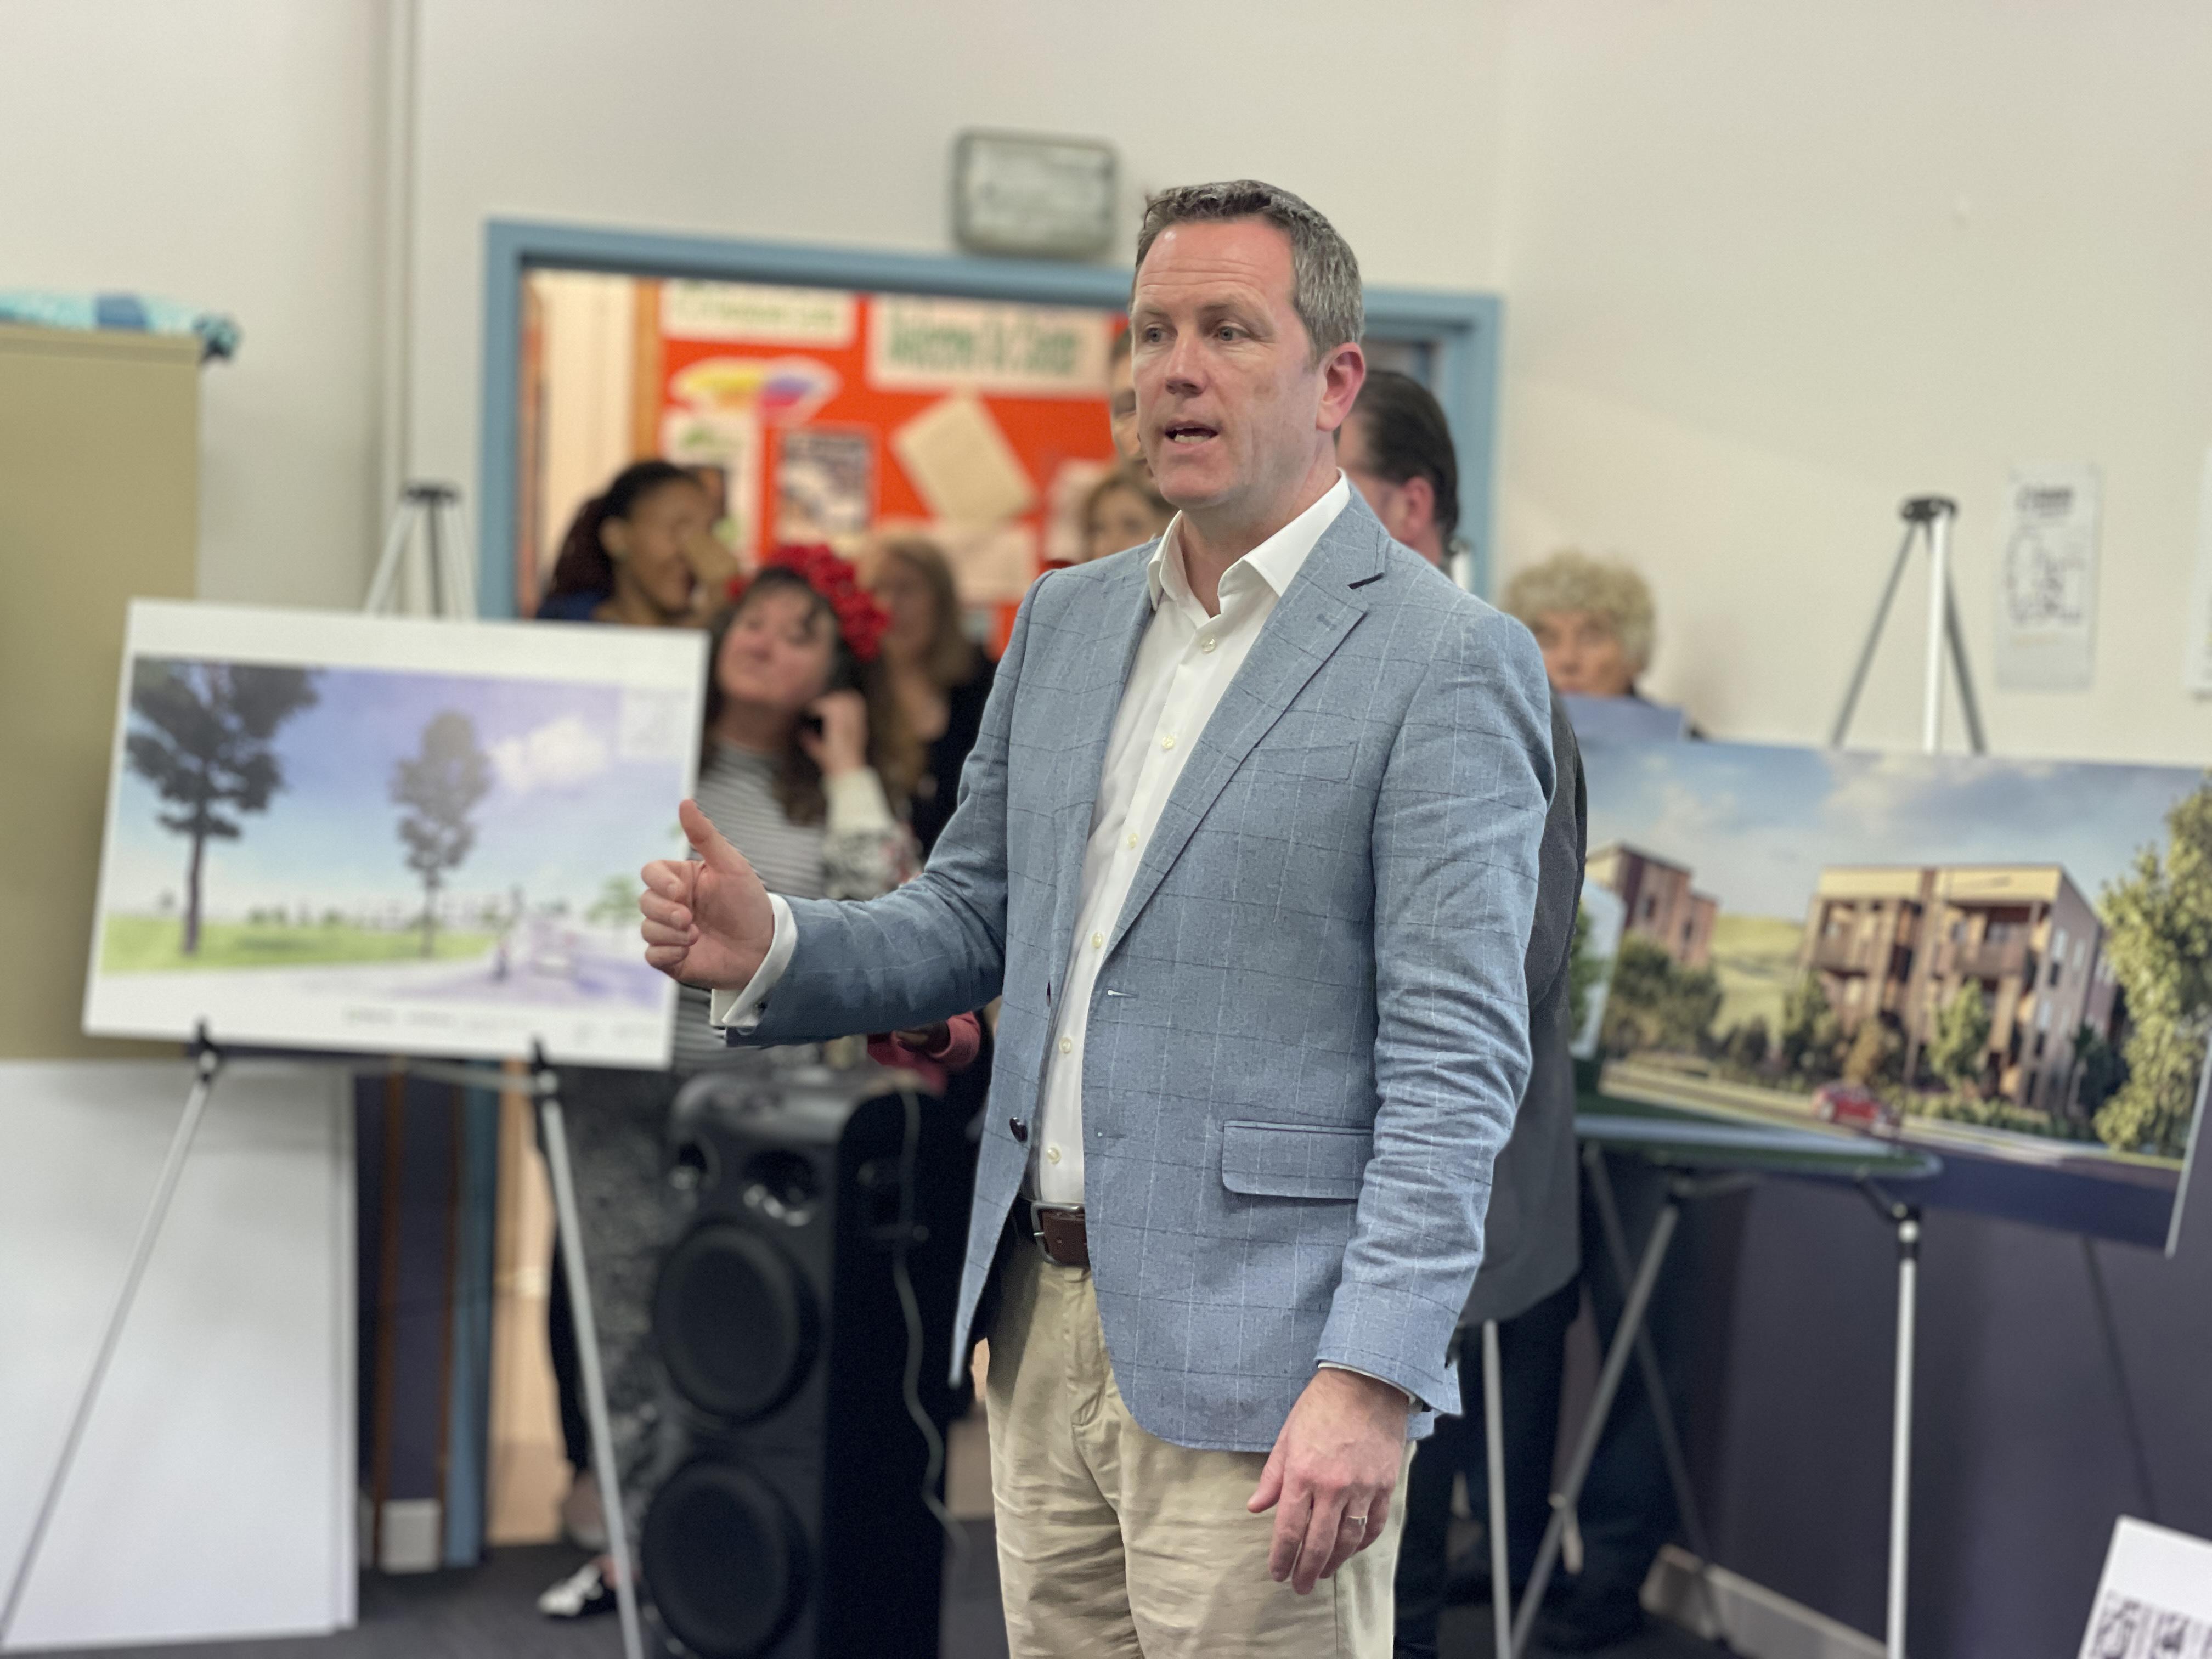 Speaking at my Glendowie Meeting on Housing Developments